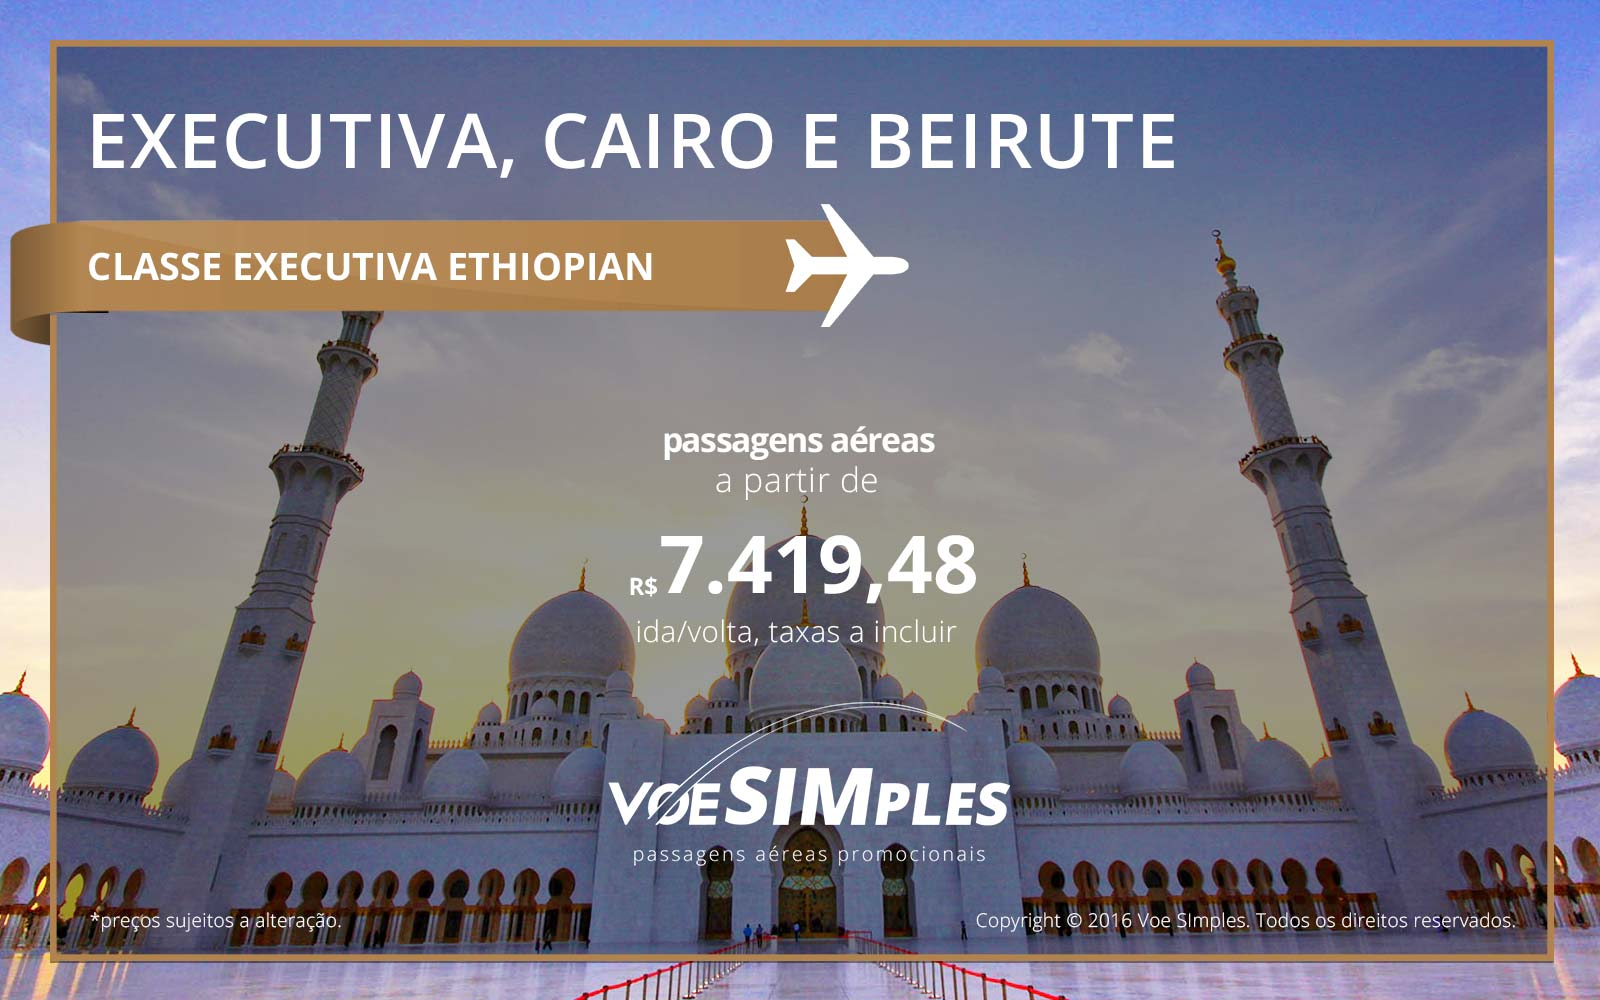 Passagem aérea Classe Executiva Ethiopian Airlines para Cairo e Beirute